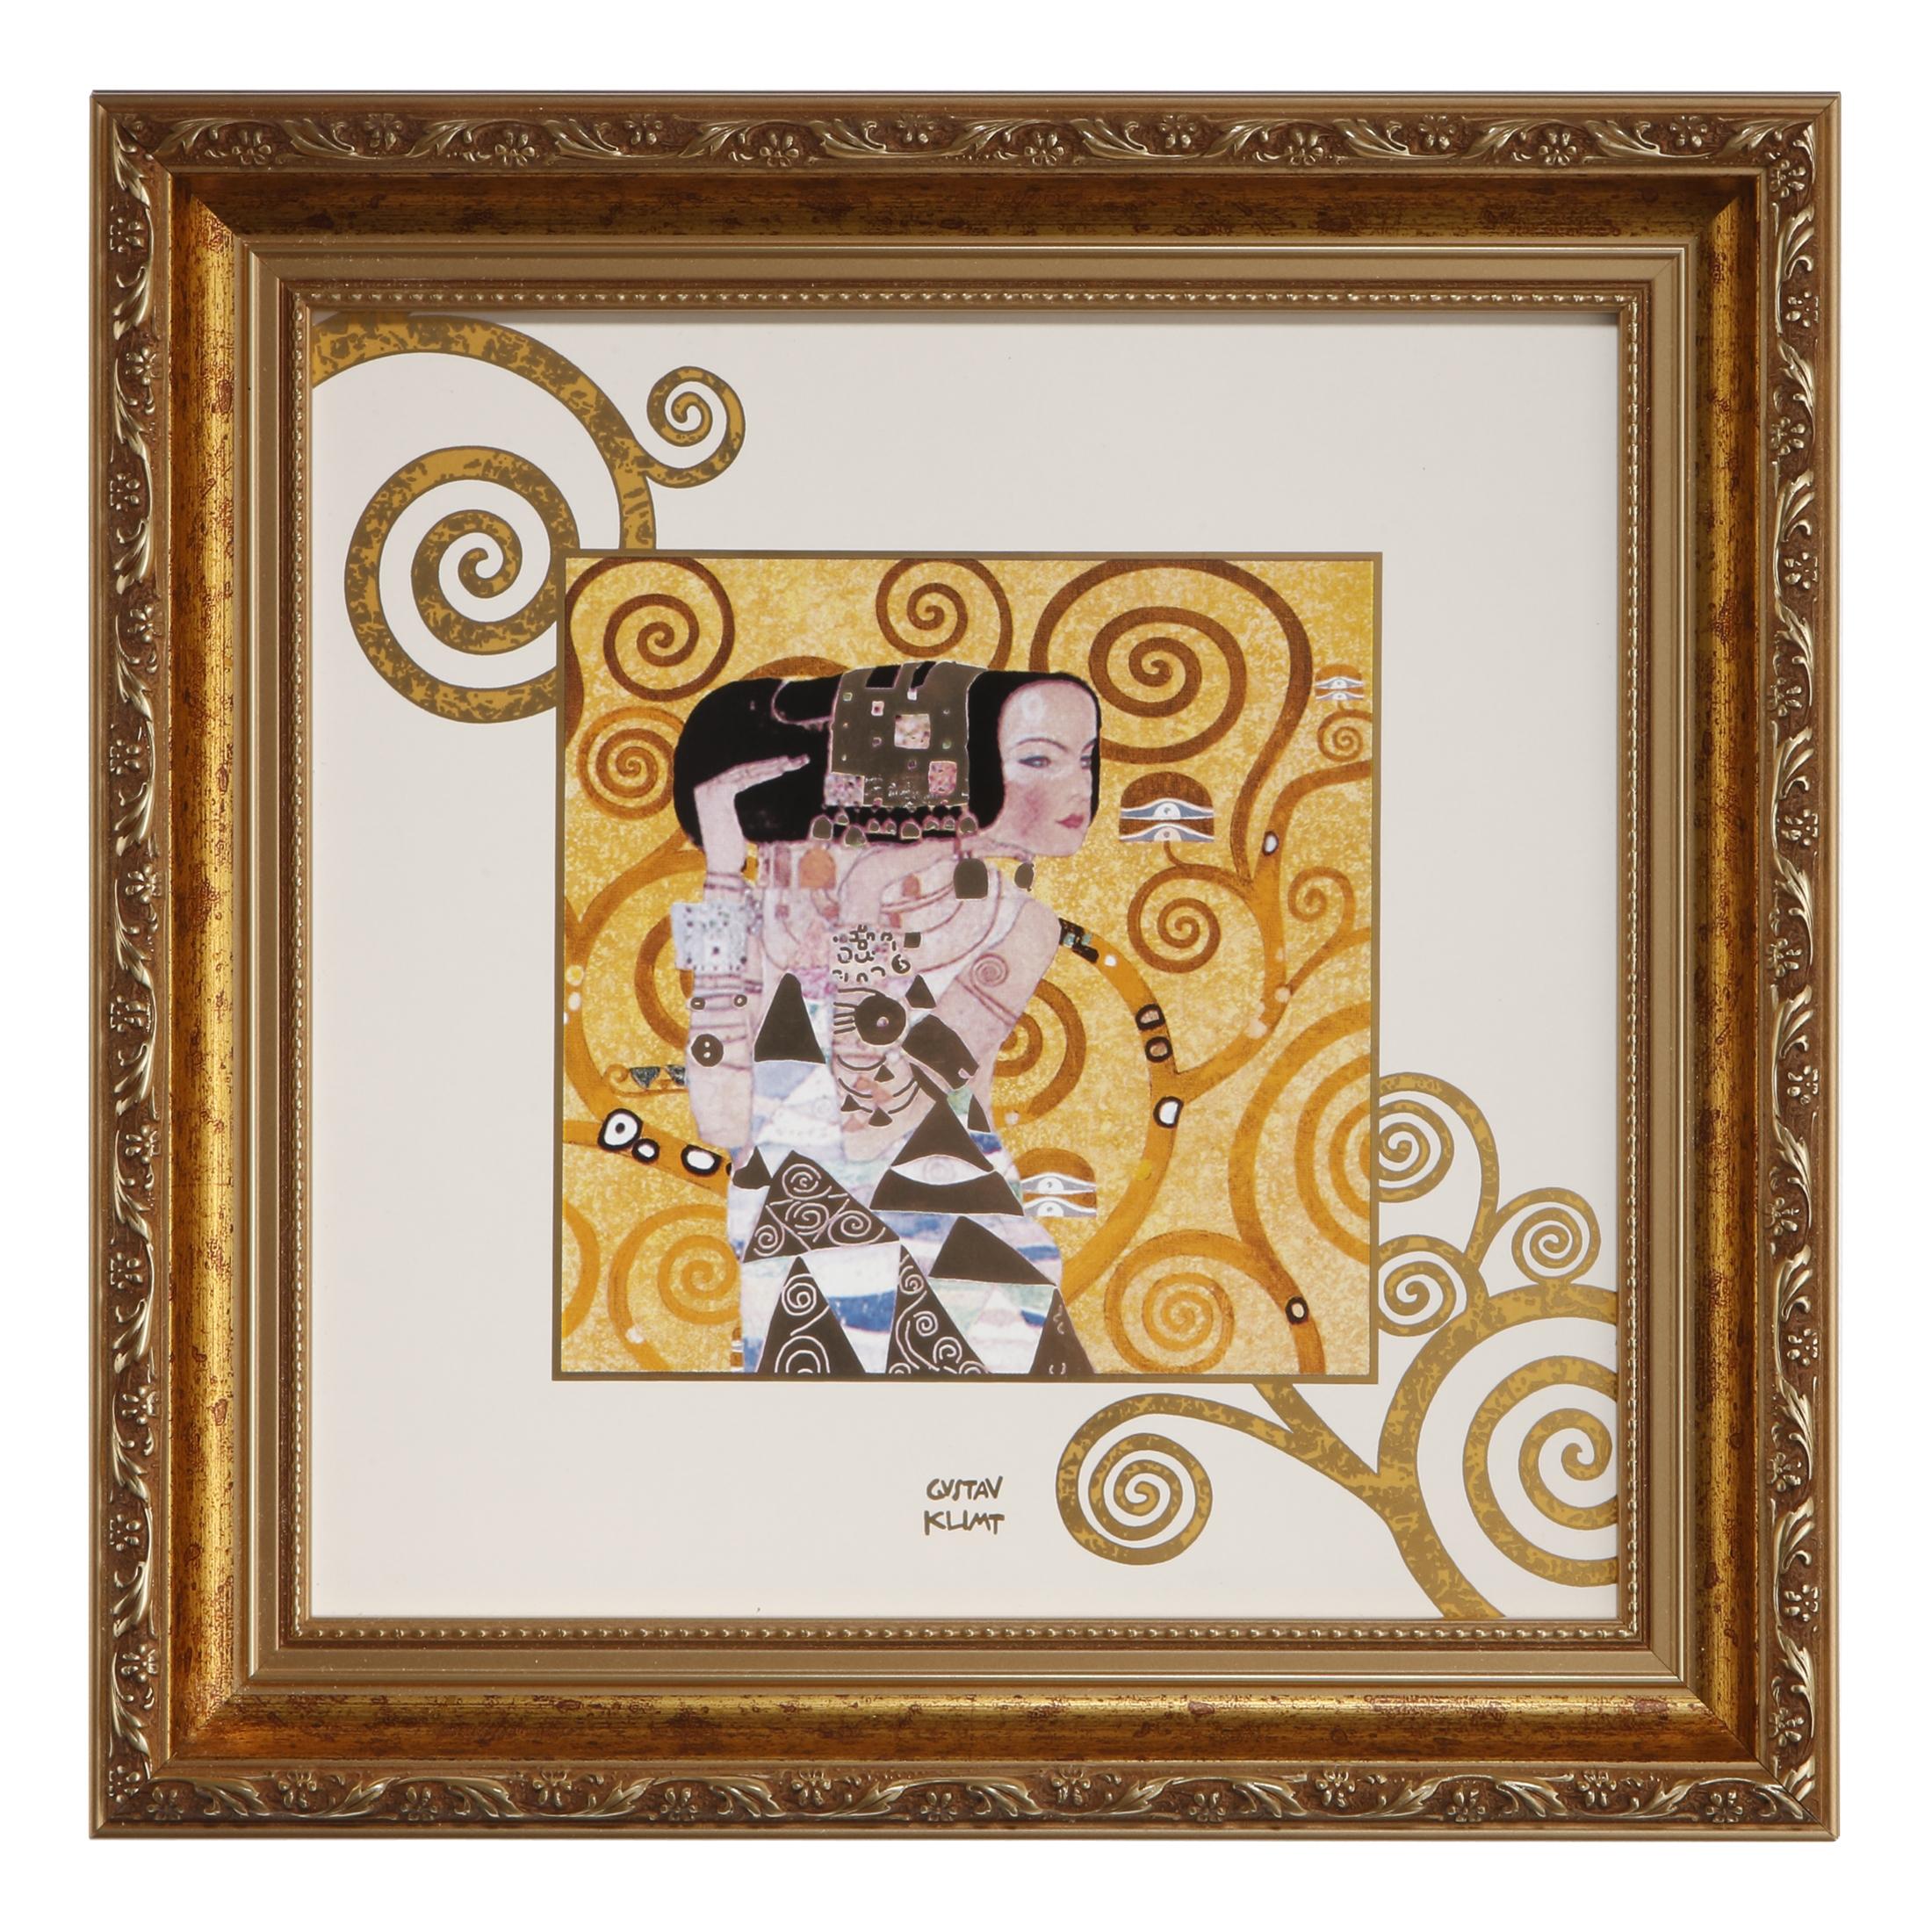 Goebel Artis Orbis Gustav Klimt 'AO P BI Erwartung' 2021